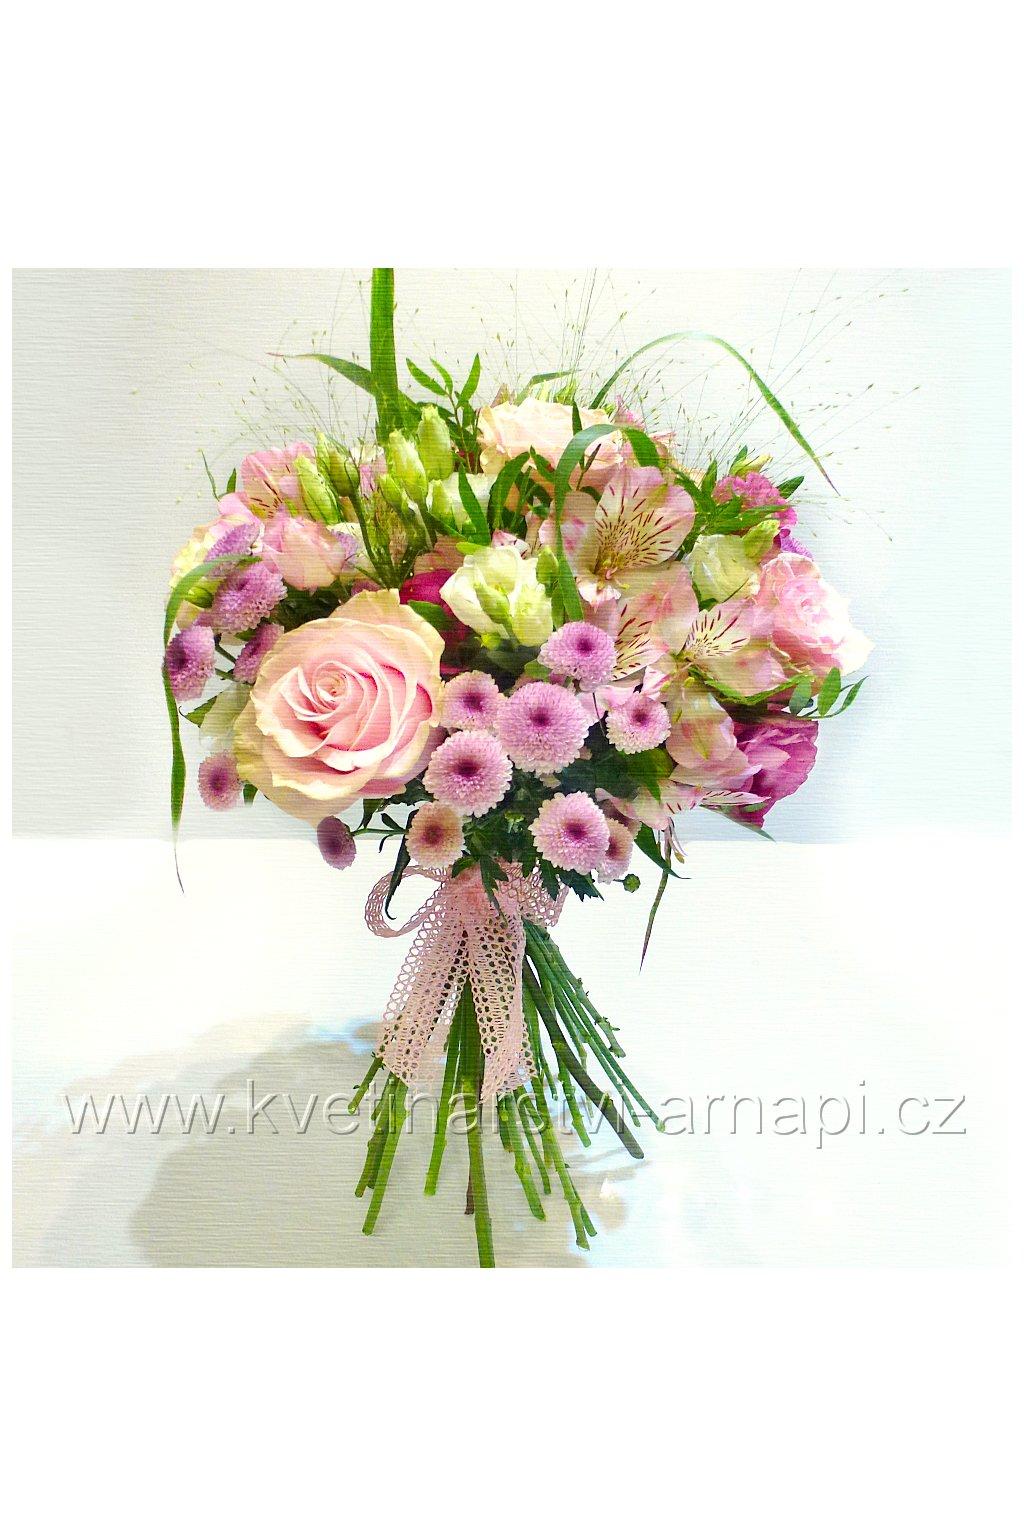 darkova kytice lucni s ruzemi eshop kvetinarstvi arnapi